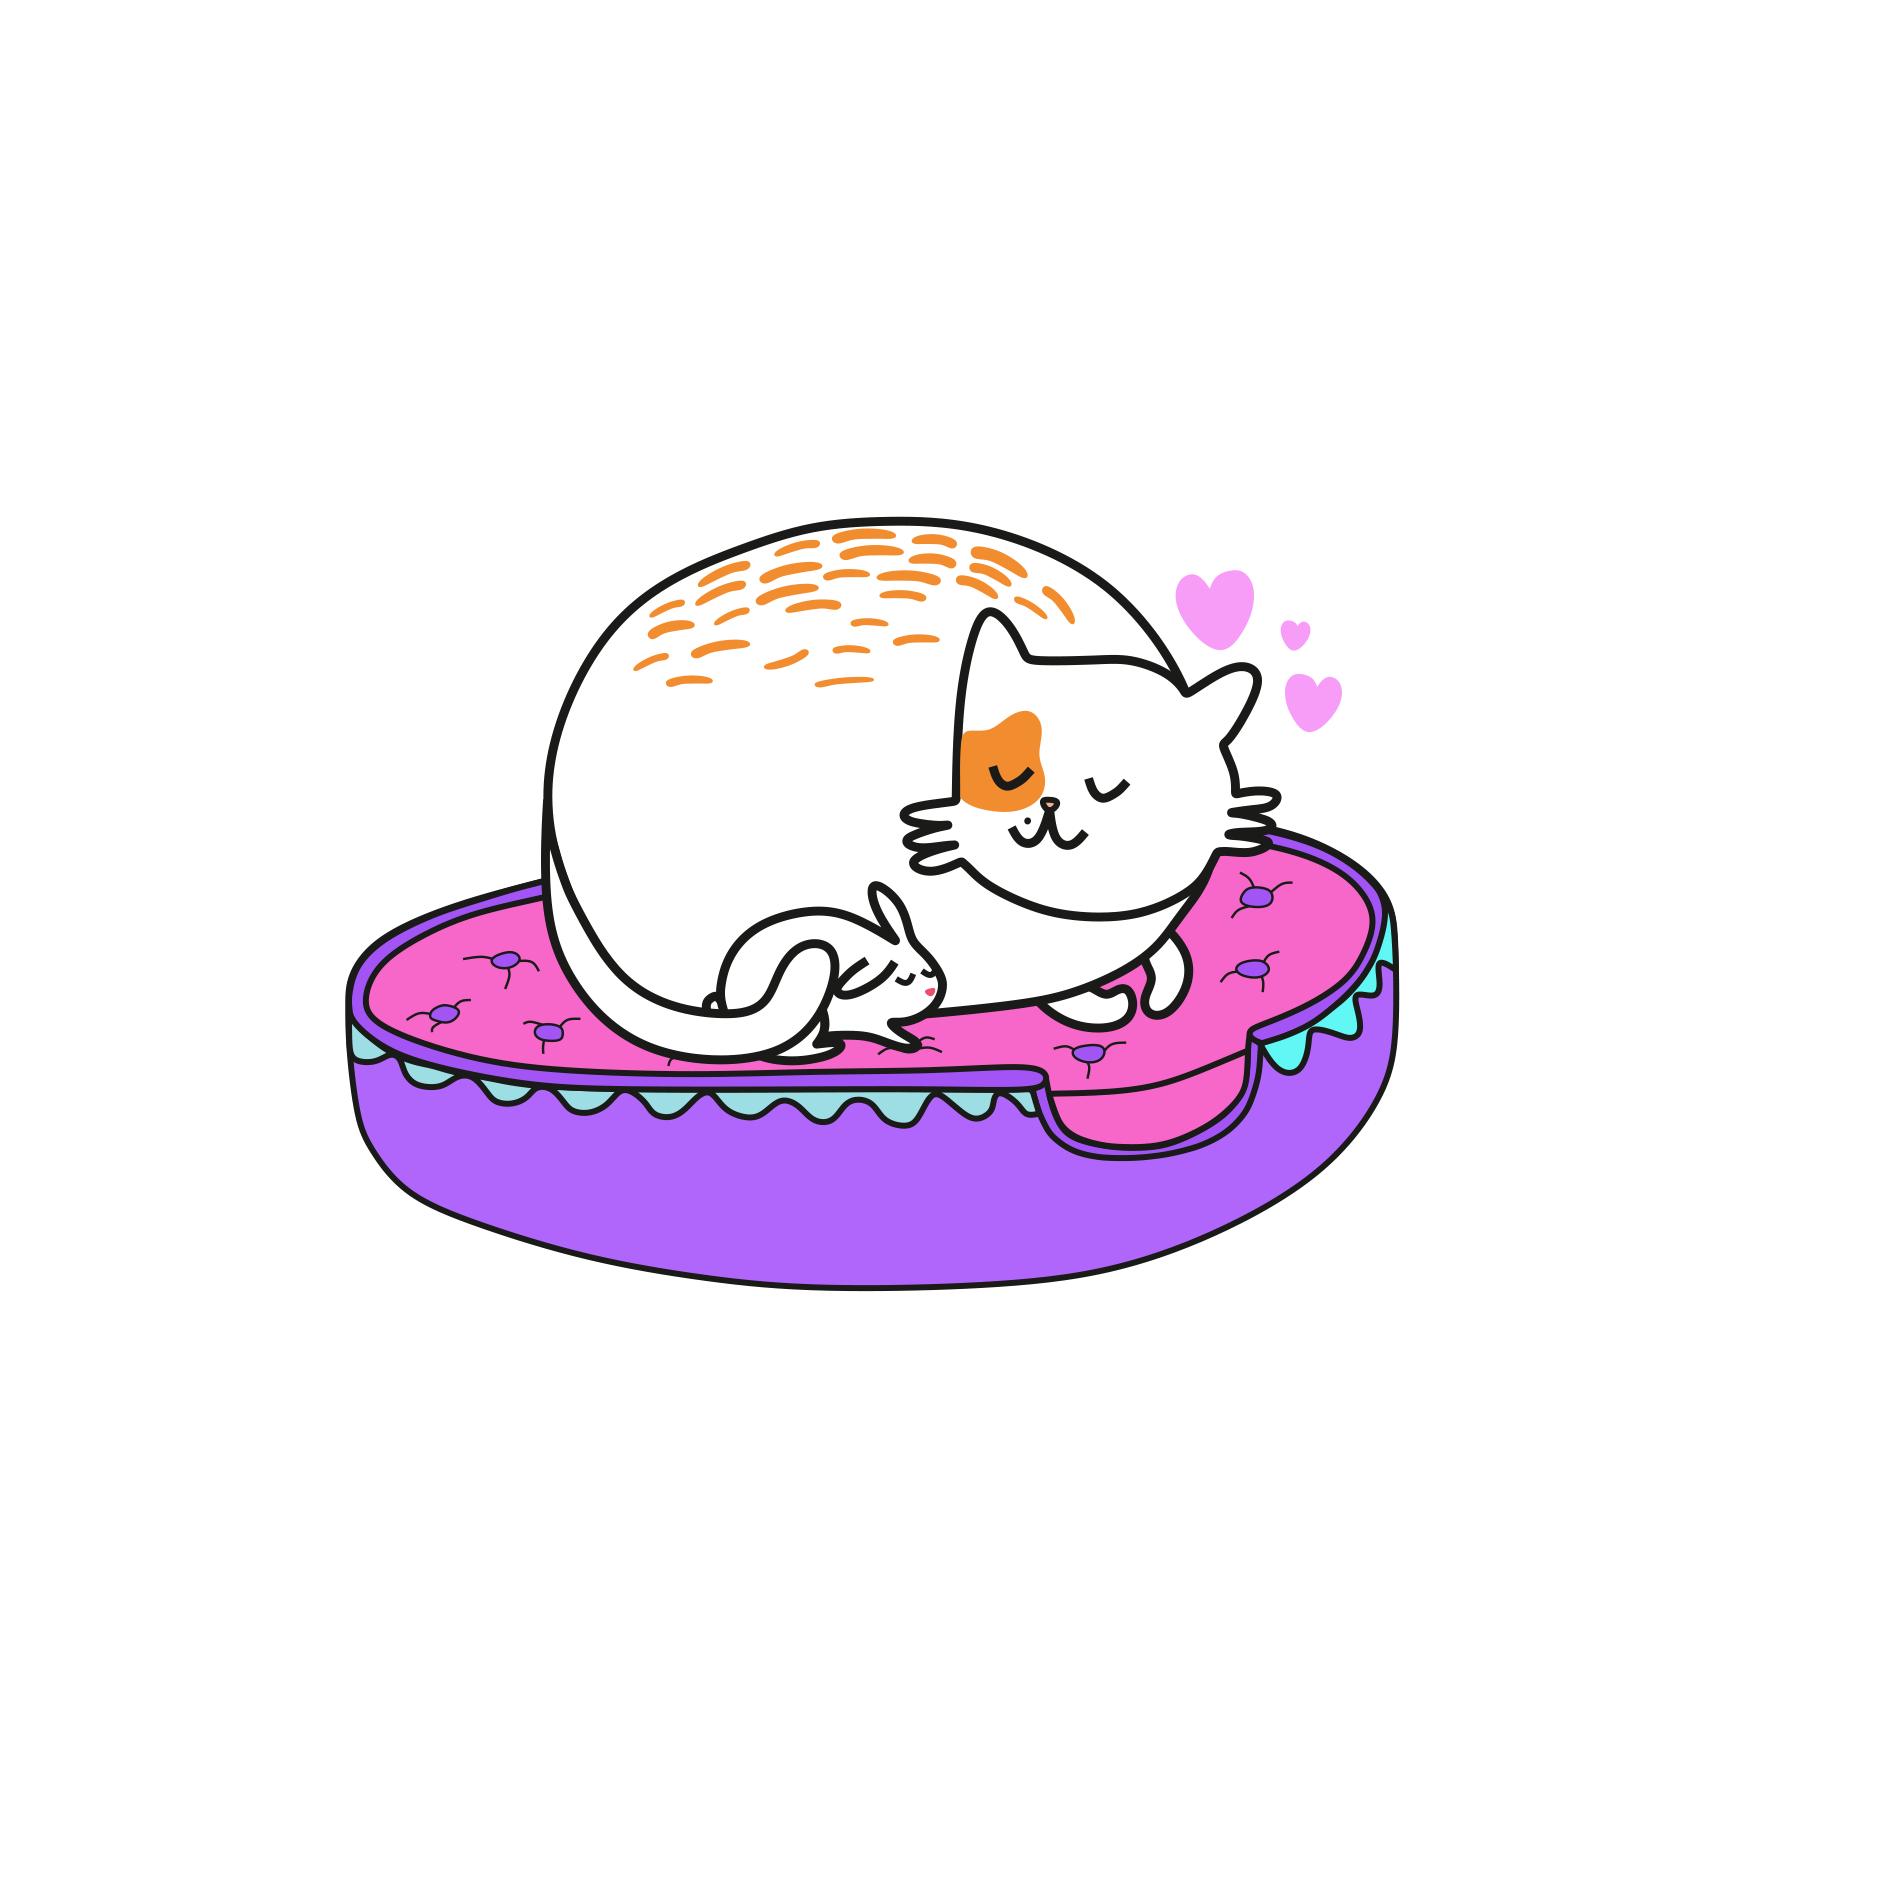 Cat Illustration Tumblr Liza is a lazy cat